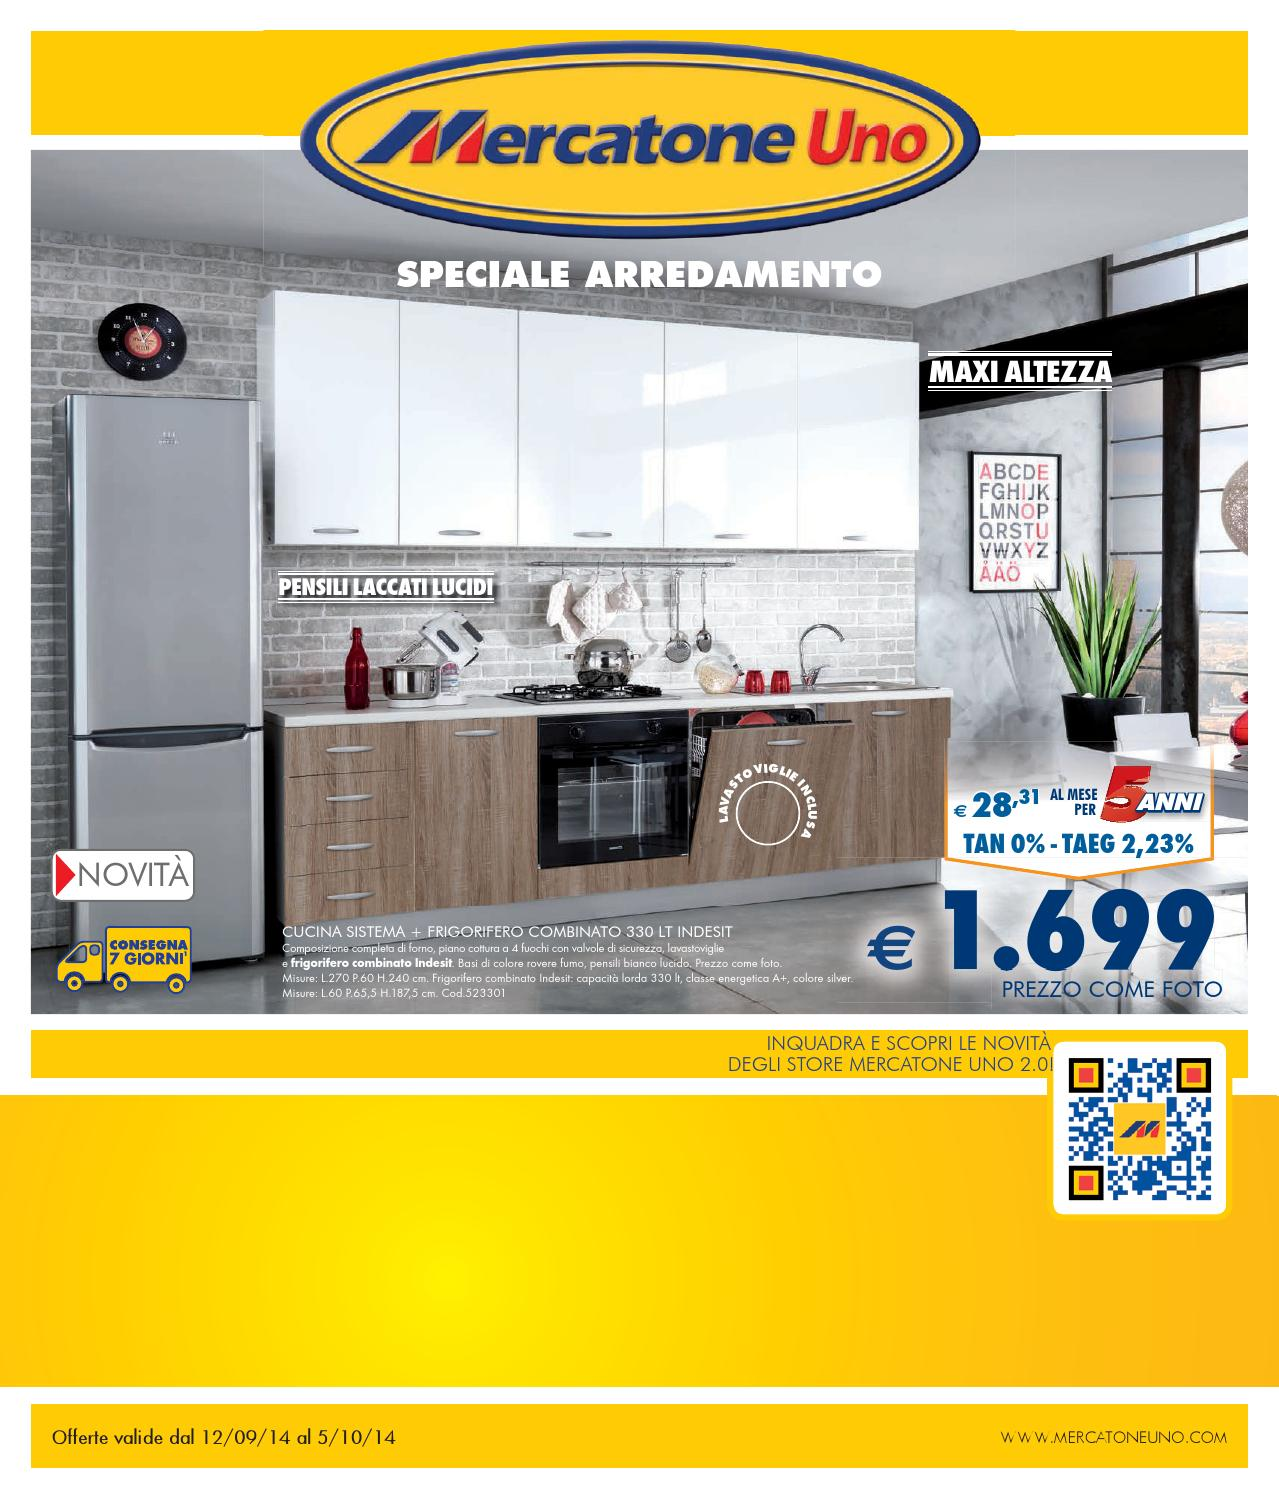 Mercatone uno 5 anni by mobilpro issuu - Cucina mercatone uno ...